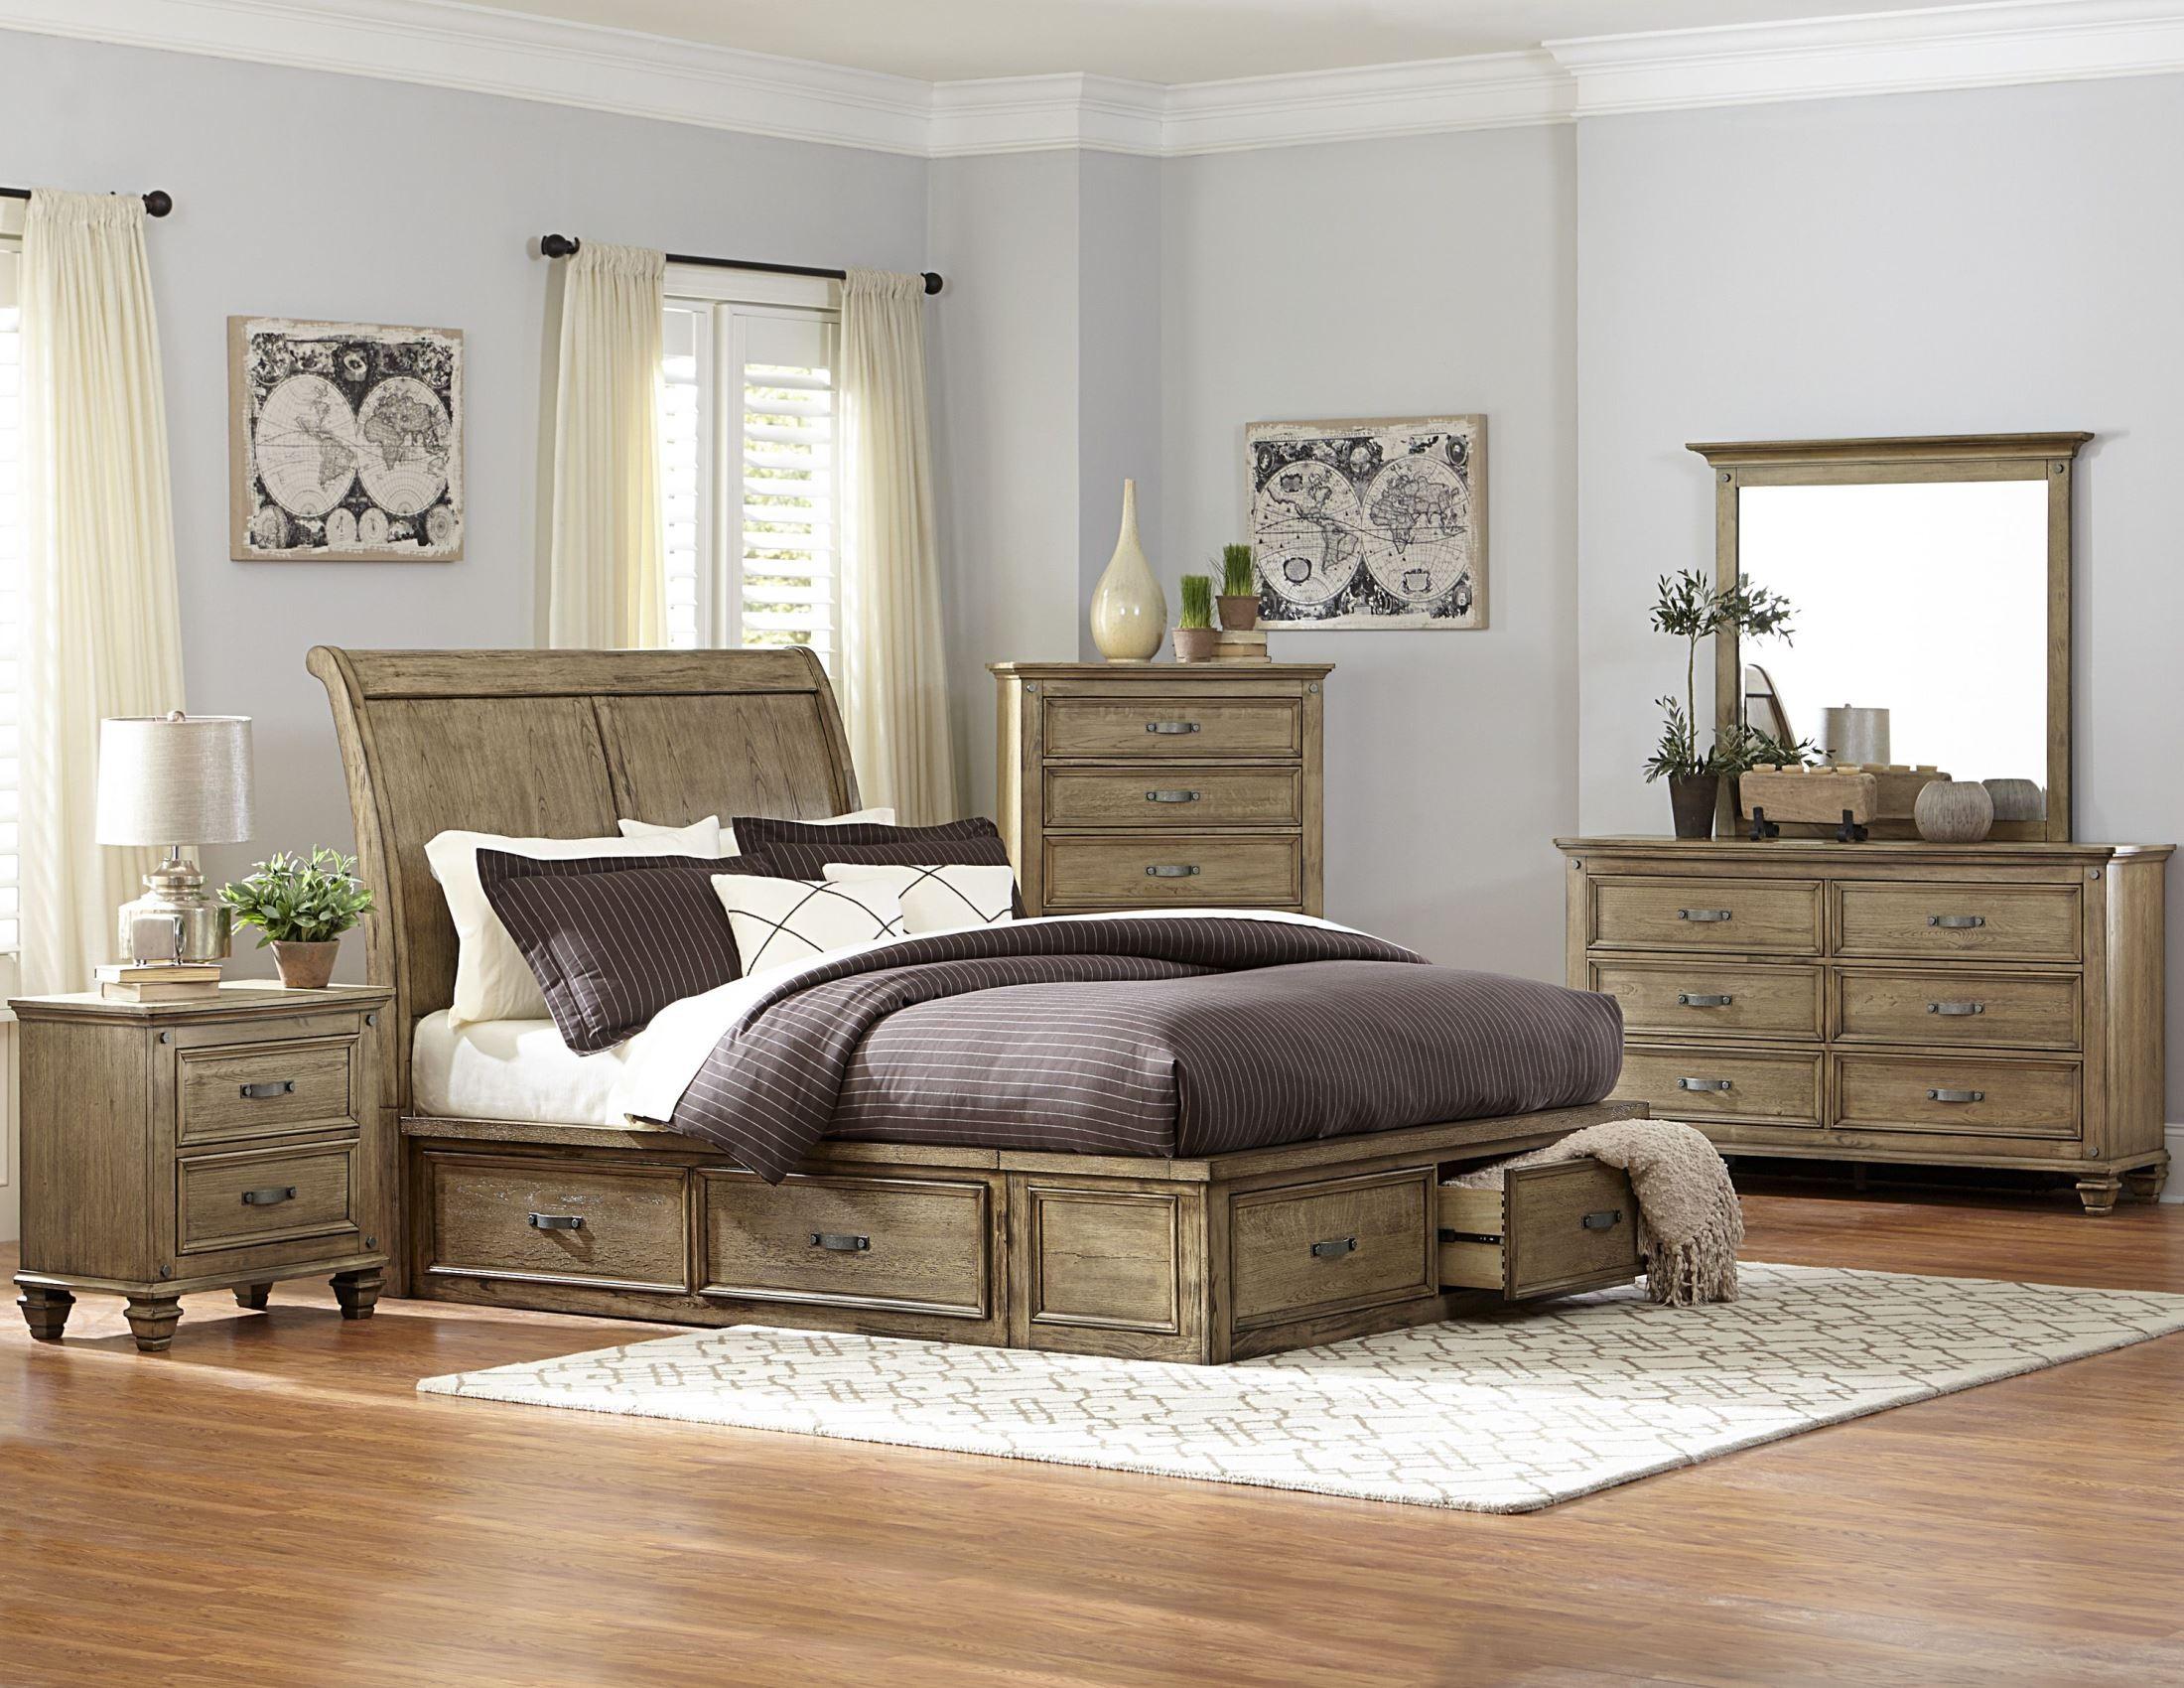 Sylvania driftwood king platform storage bed from - Platform bedroom sets with storage ...